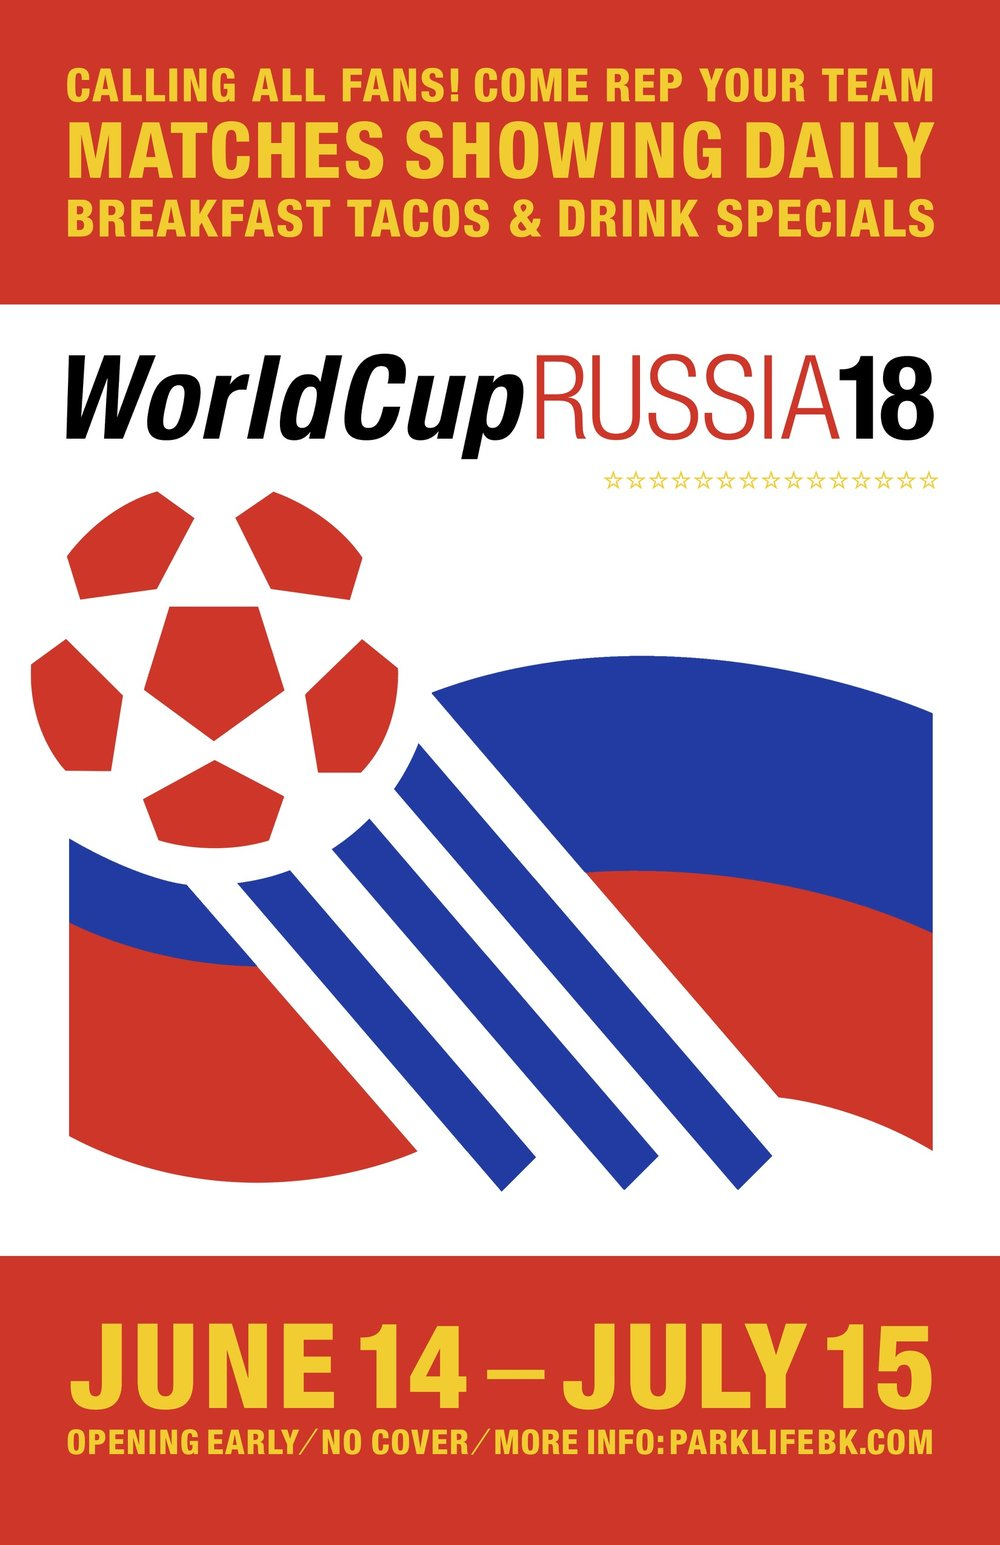 WORLD CUP 18 PARKLIFE-2.jpg